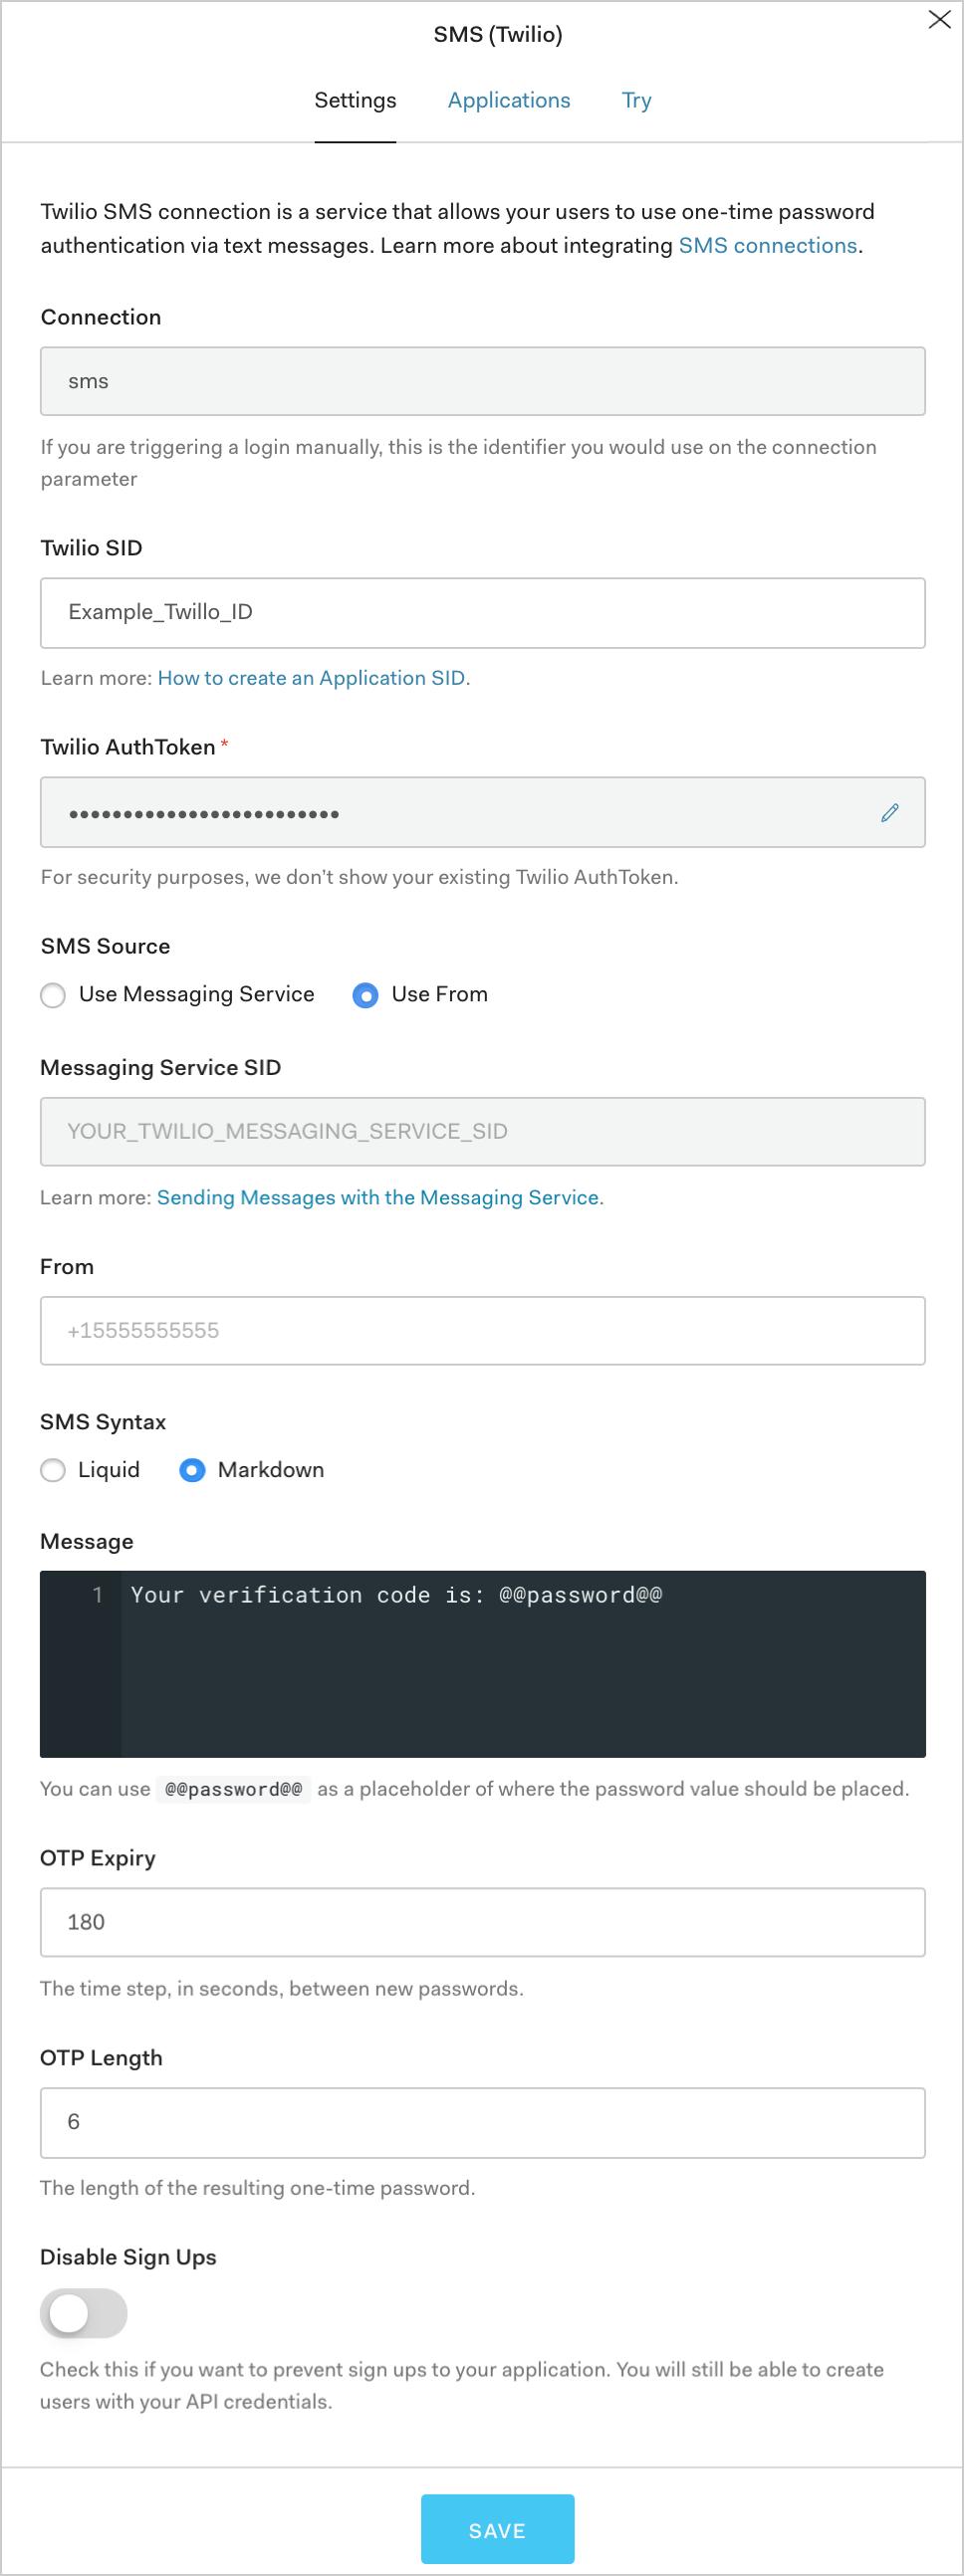 Configure SMS Passwordless